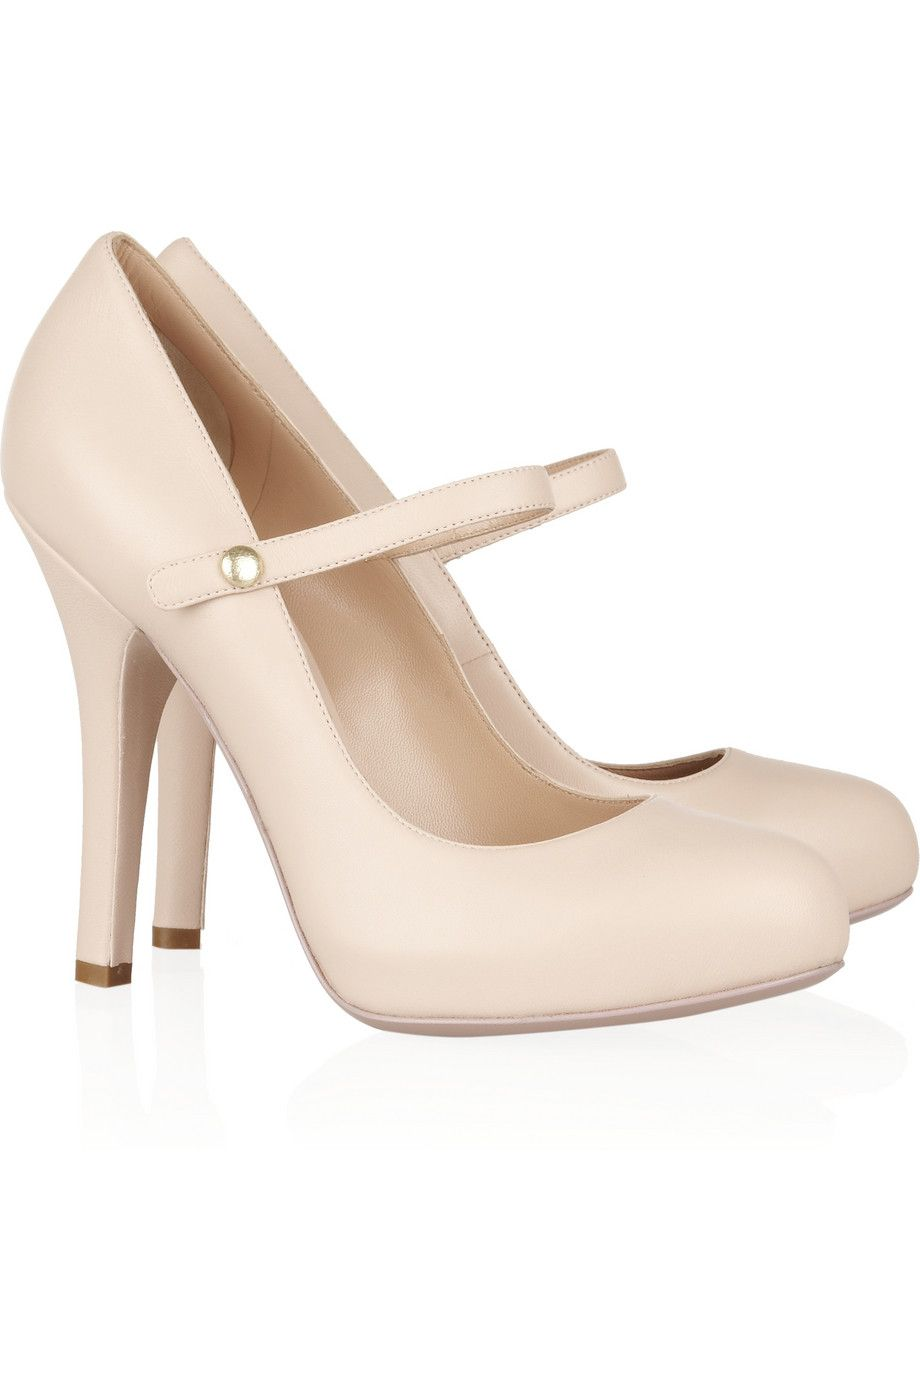 Zapatos beige para mujer wfhJXREoU